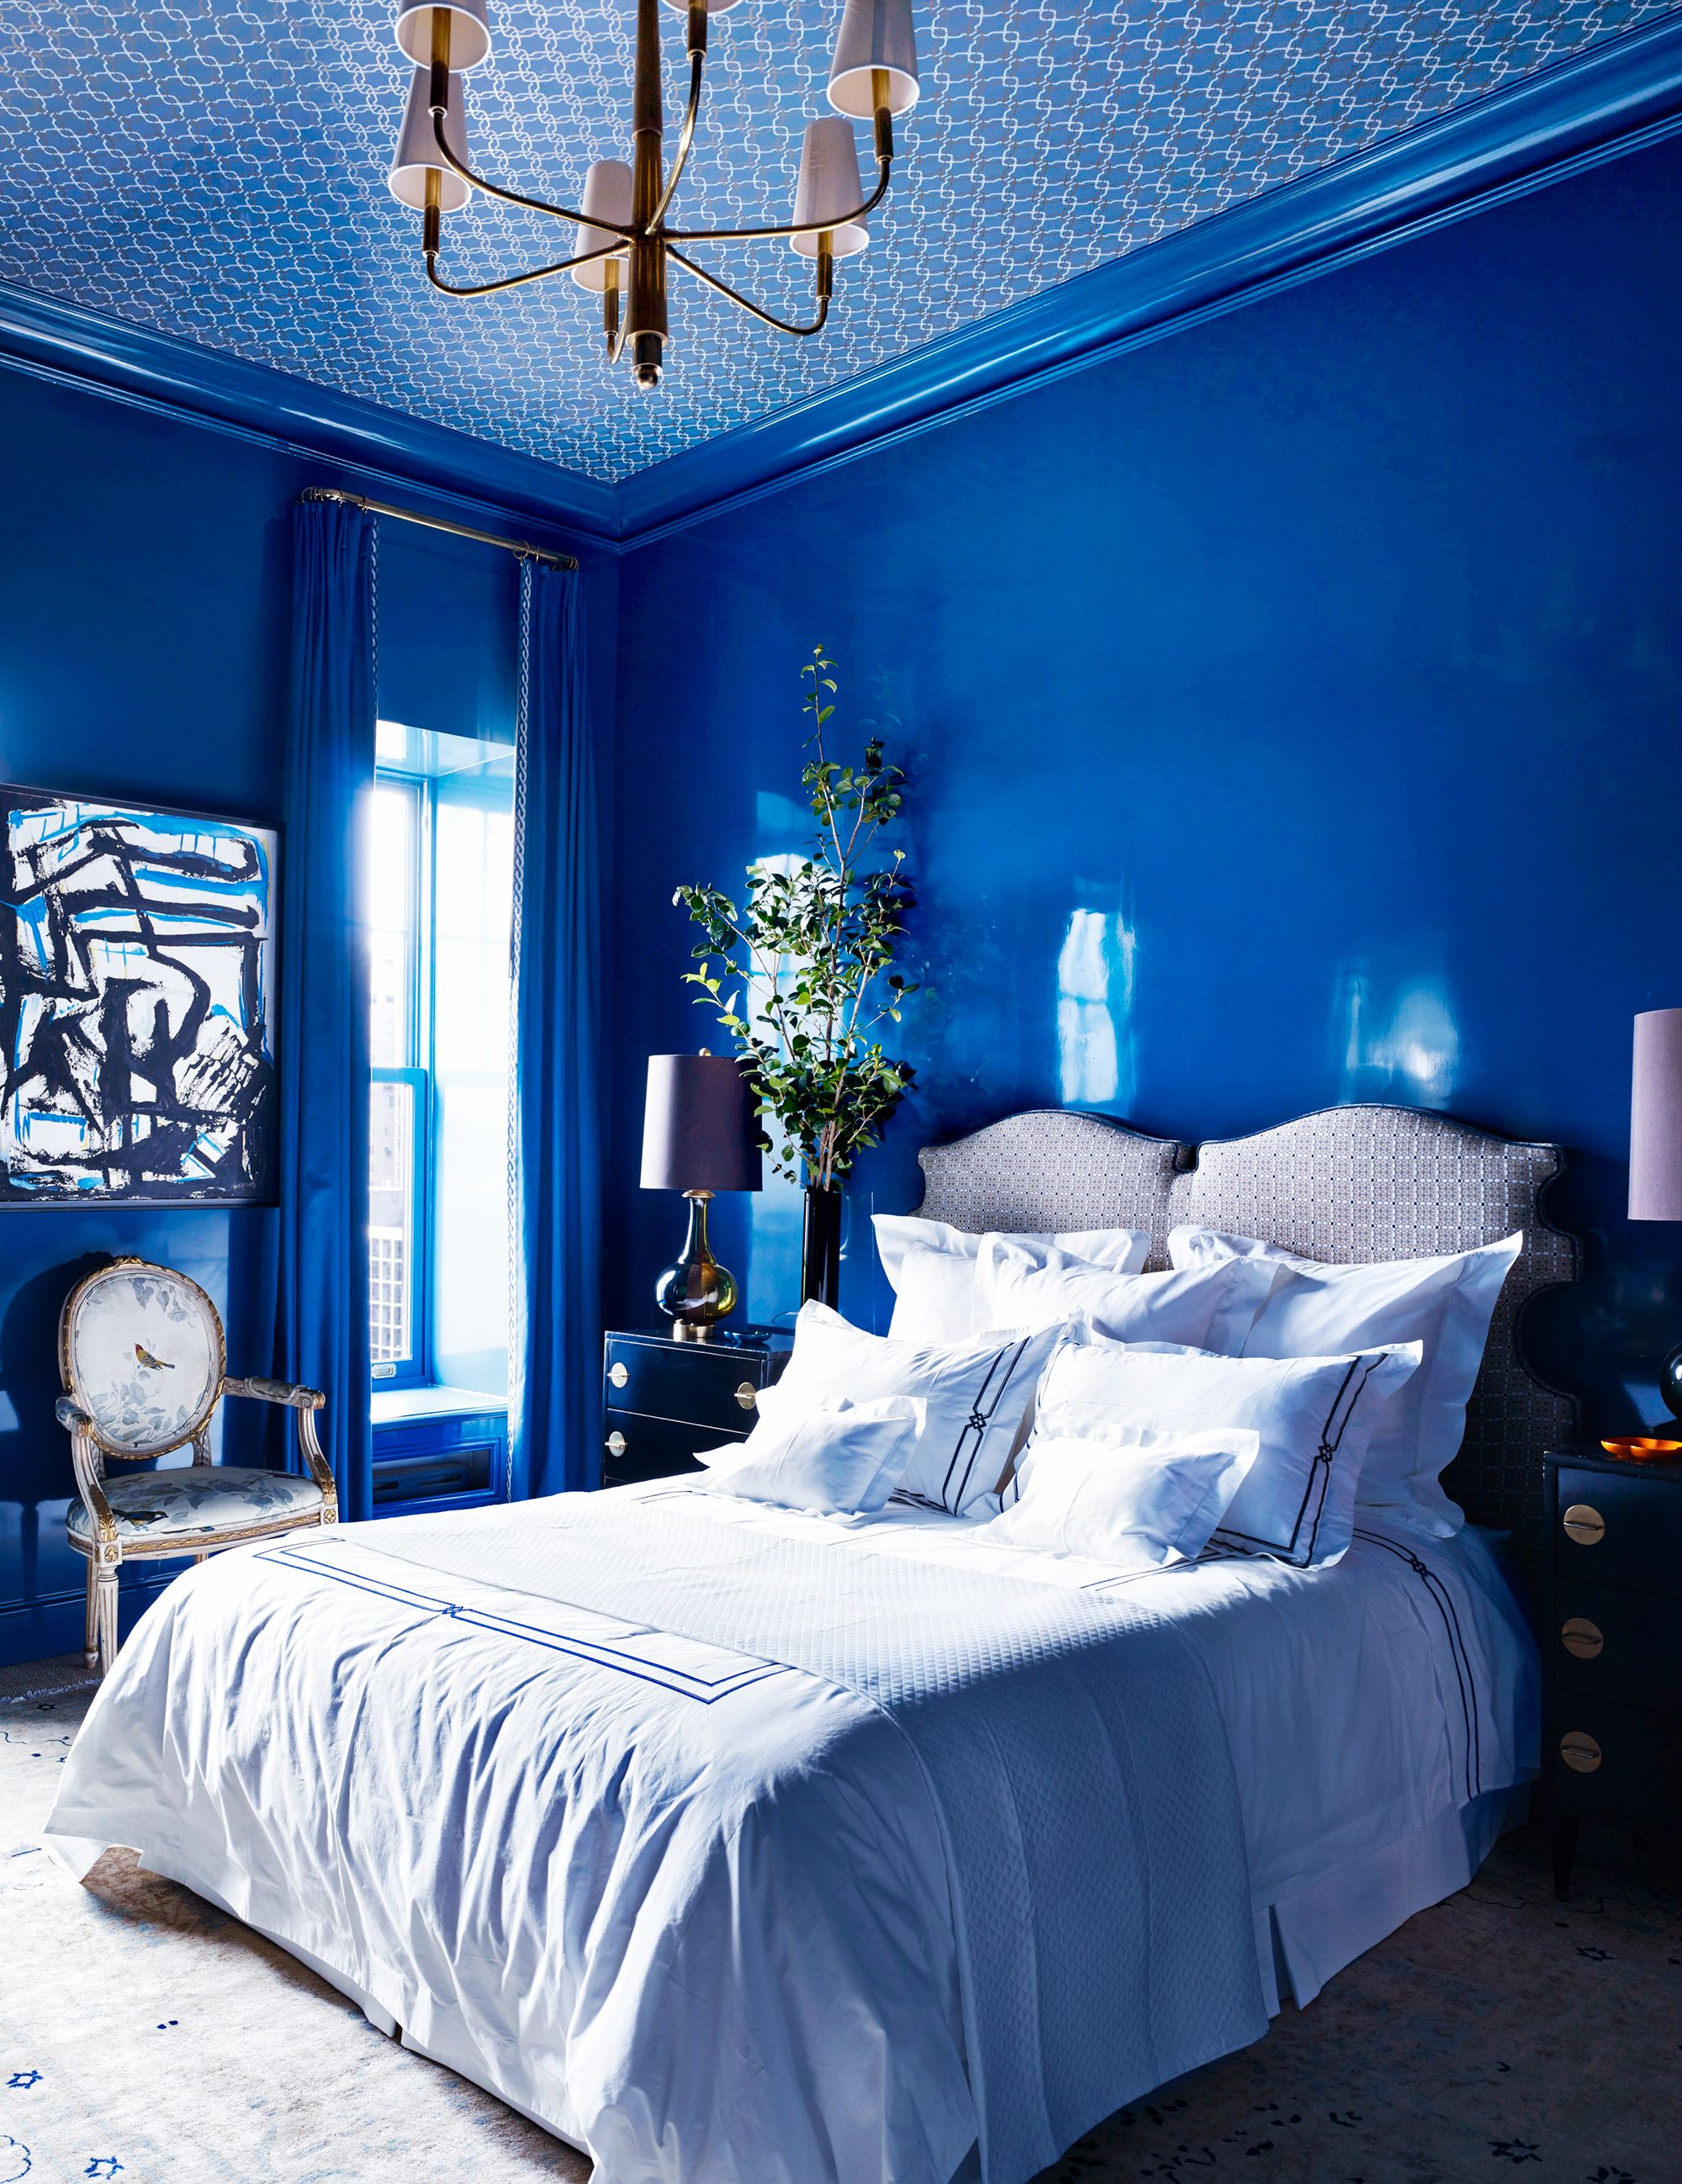 20 best bedroom colors 2019 relaxing paint color ideas for bedrooms rh housebeautiful com best bedroom paint colors benjamin moore best bedroom paint colors behr